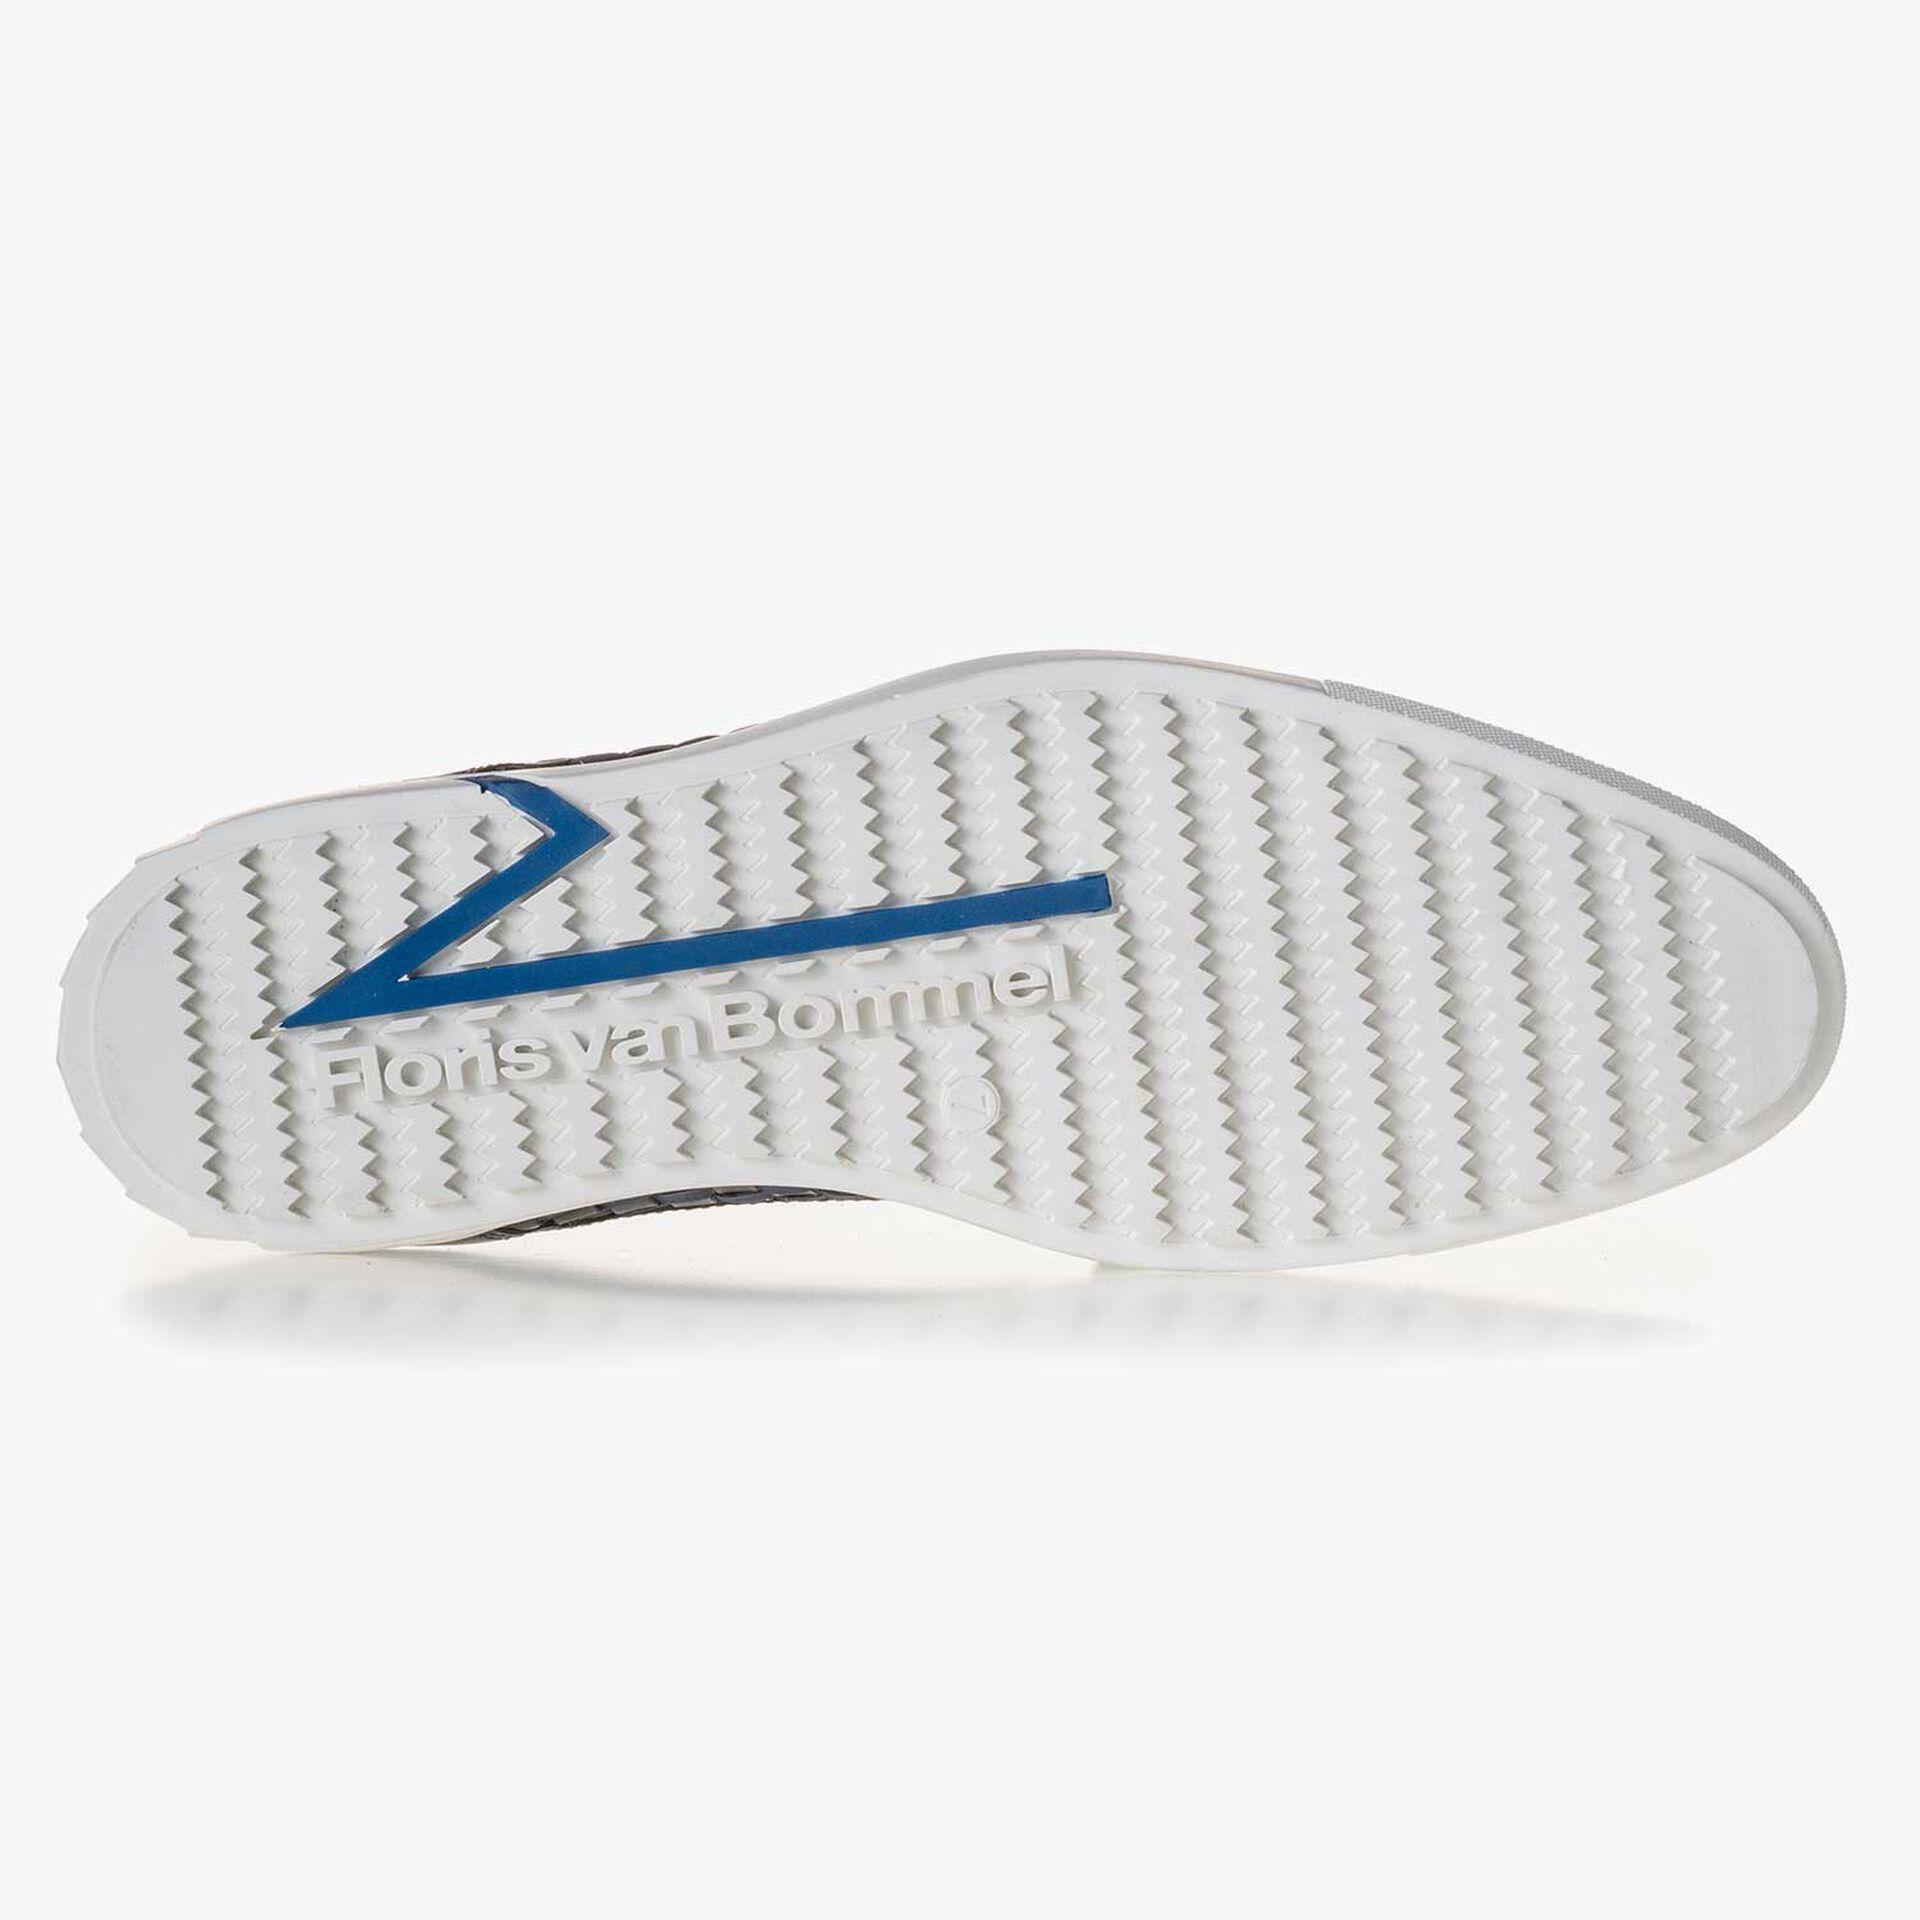 Premium dark blue braided leather lace shoe